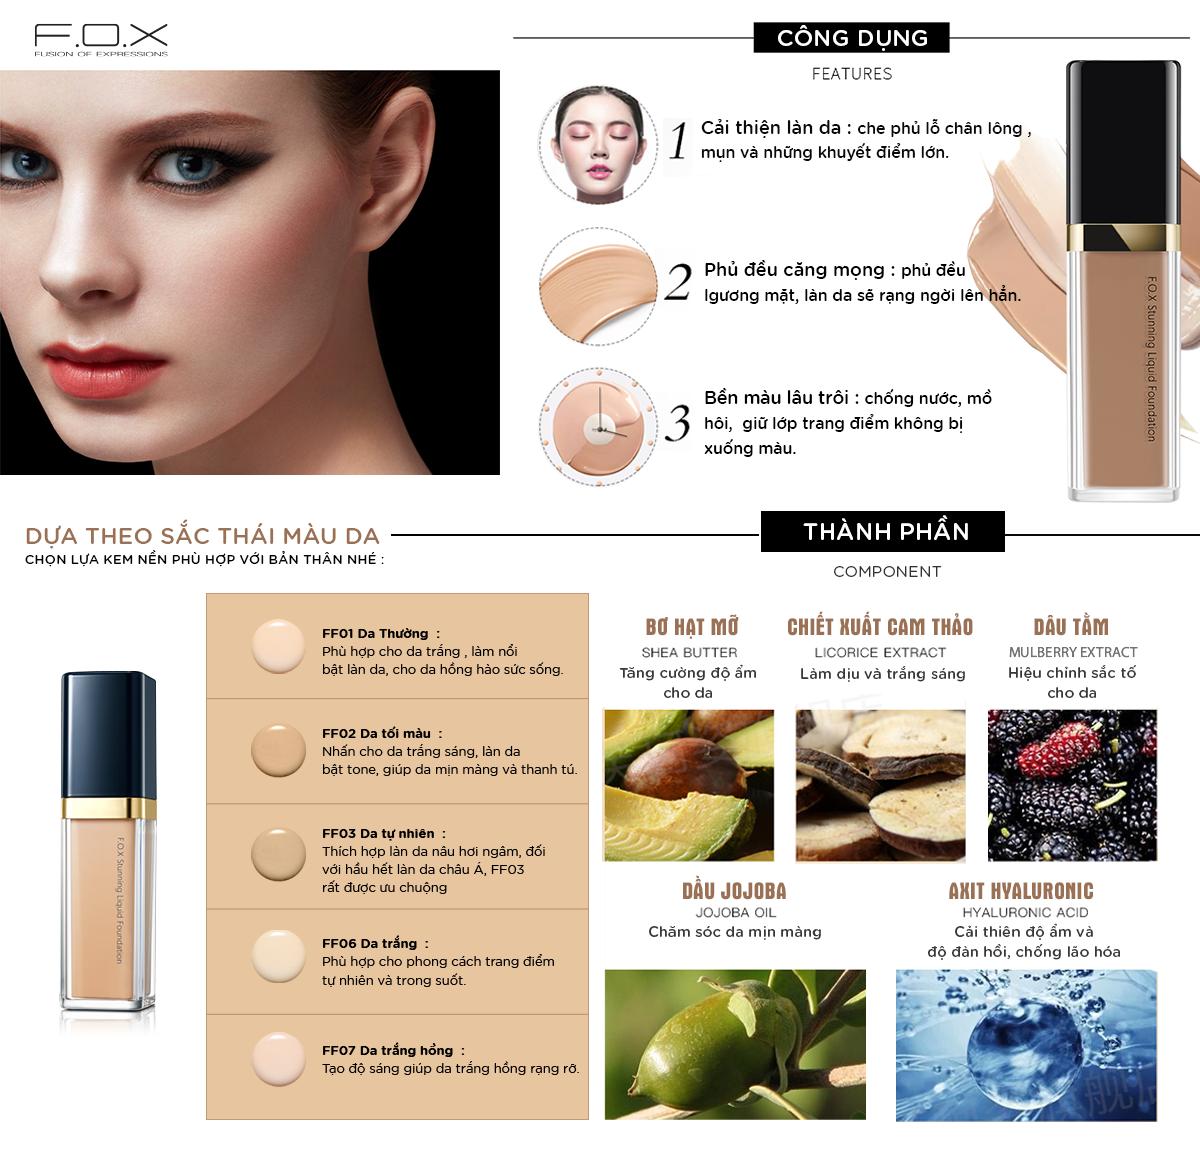 Kem Nền FOX Stunning Liquid Foundation SPF 30++ Dưỡng Ẩm Làm Sáng Da 30ml -  Fox Website